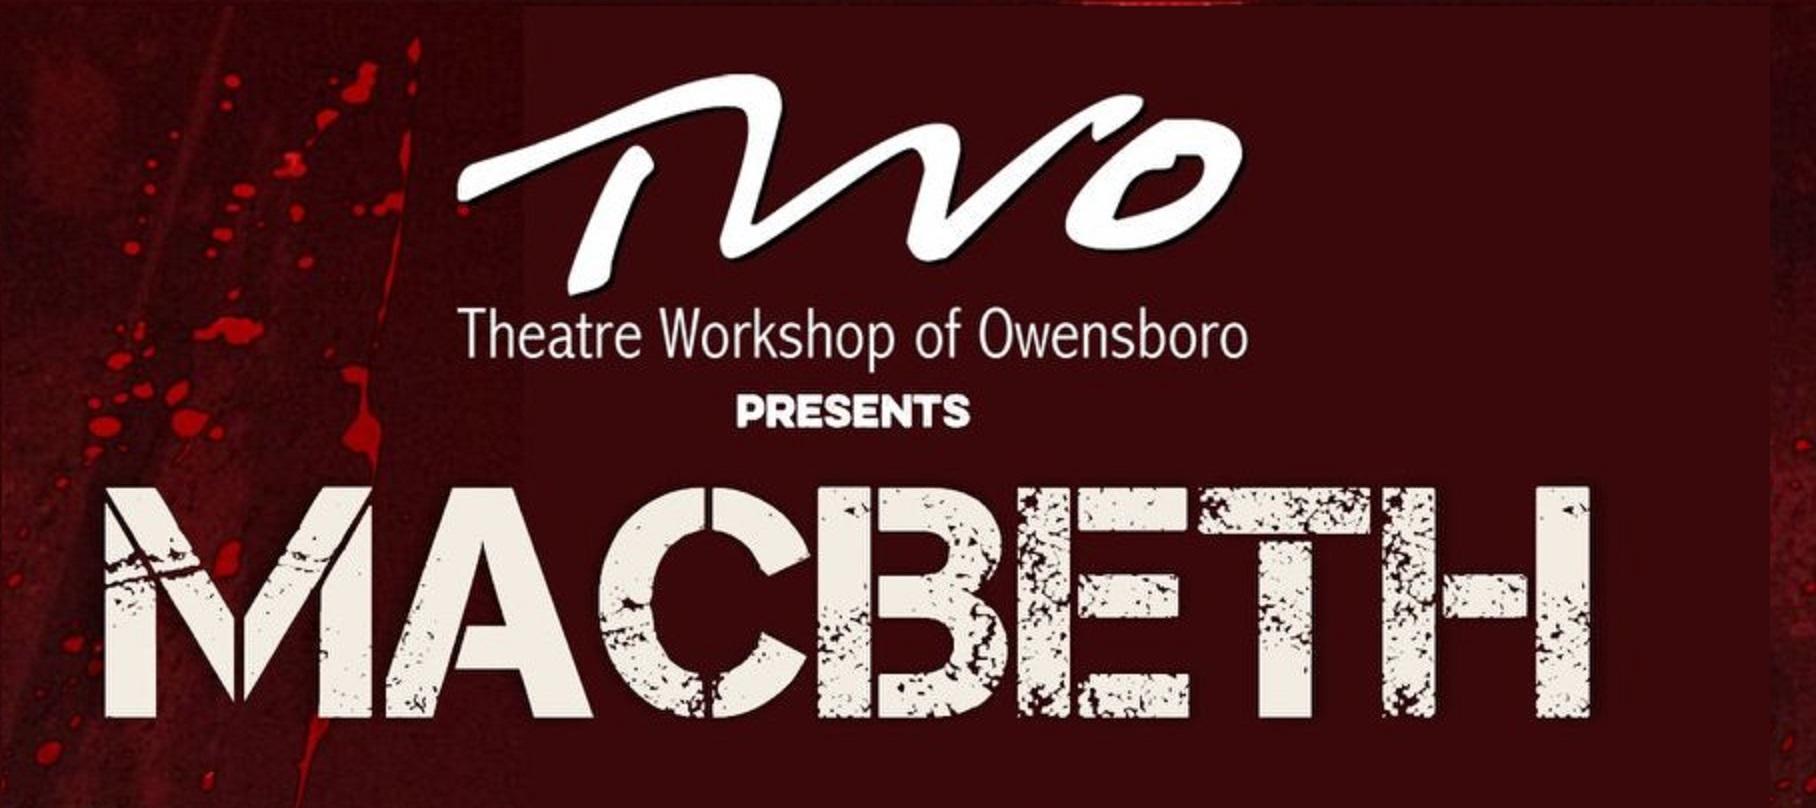 Theatre Workshop Presents MACBETH